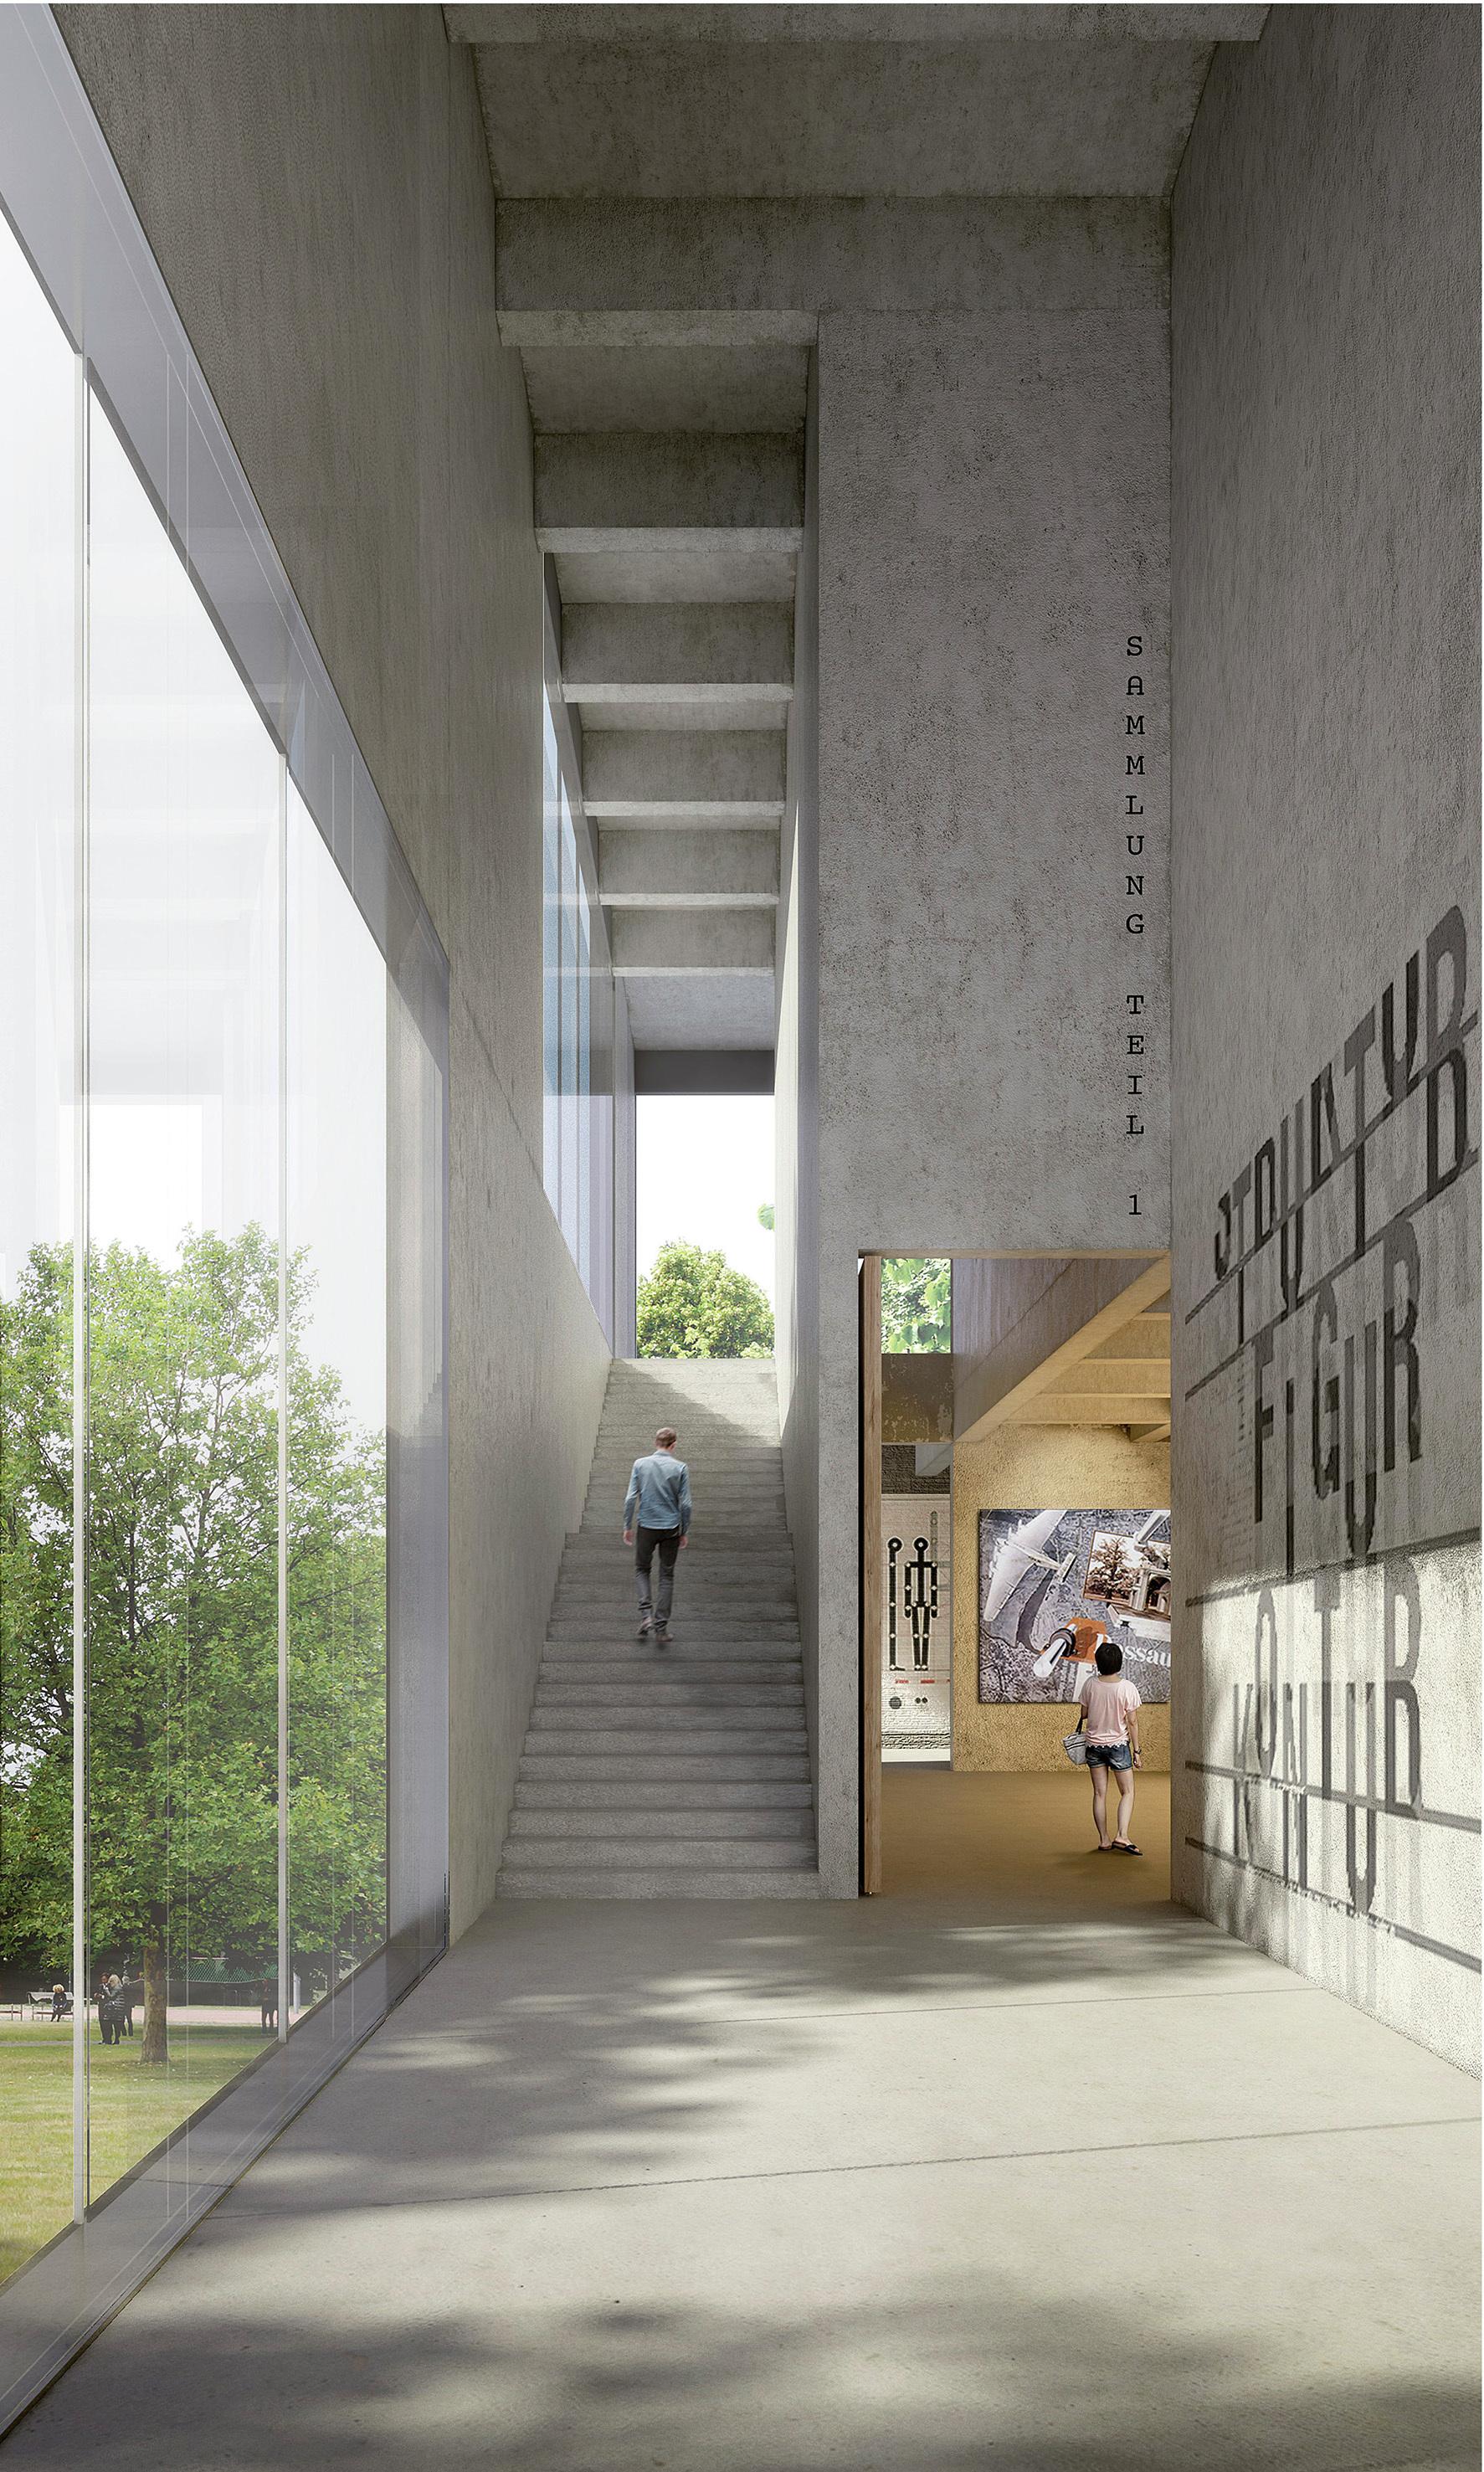 Foundation Art And Design London